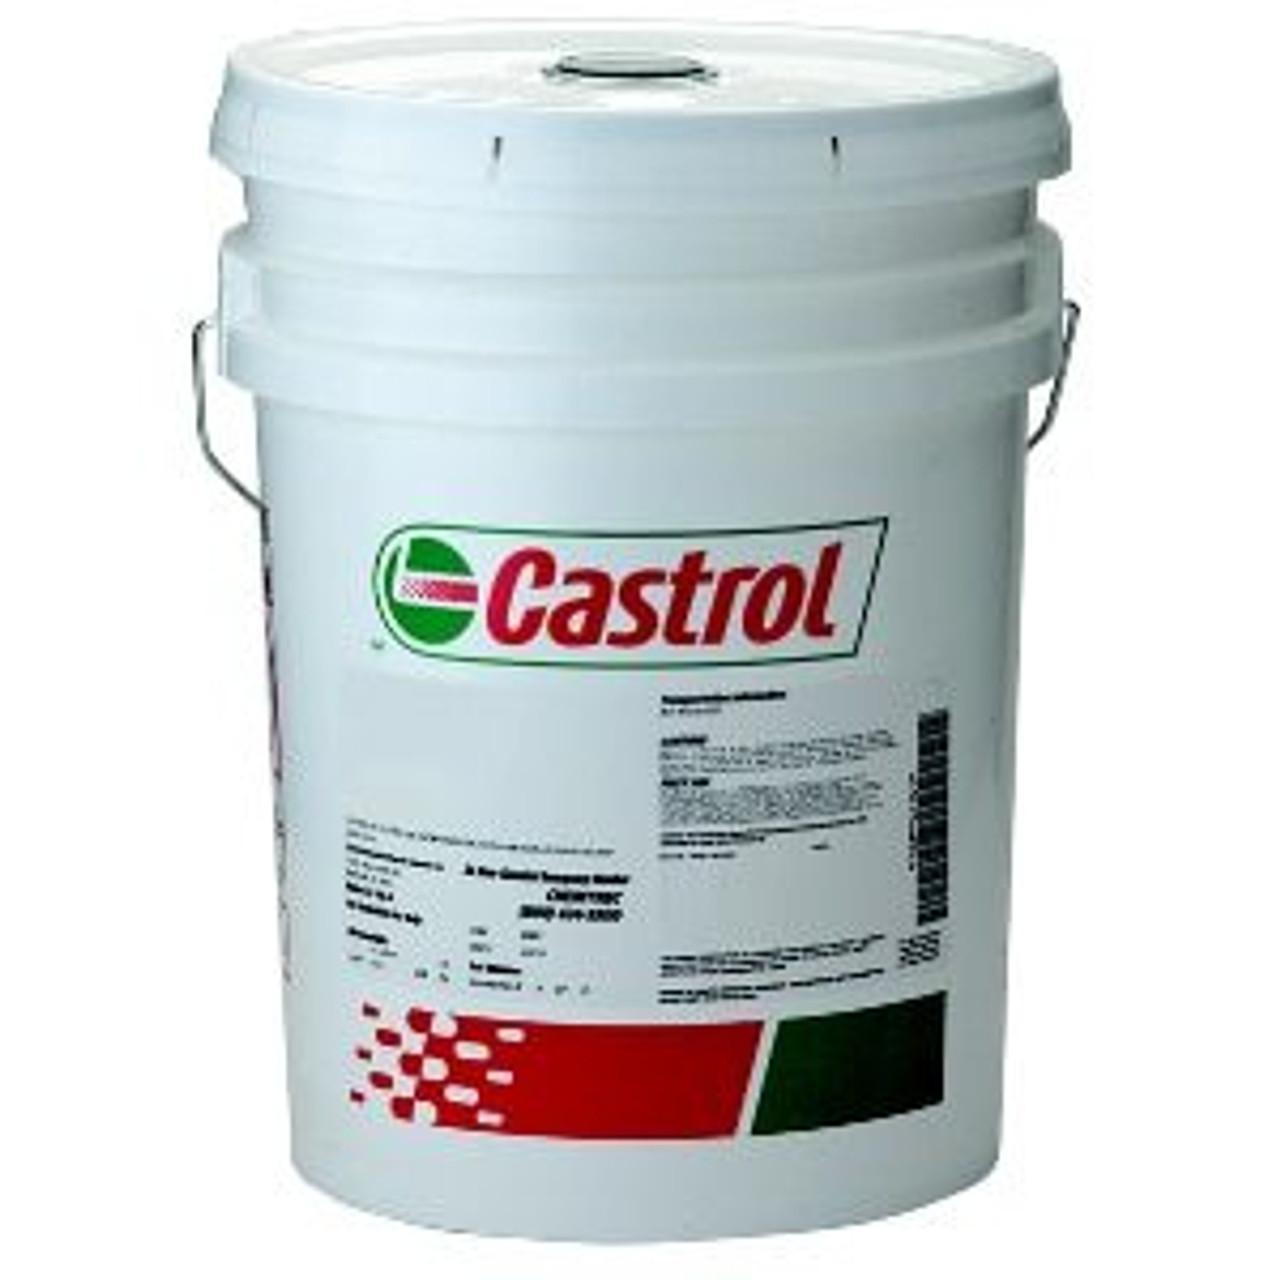 Castrol Syntilo 9930 Synthetic Coolant for ferrous alloys - 5 gal pail